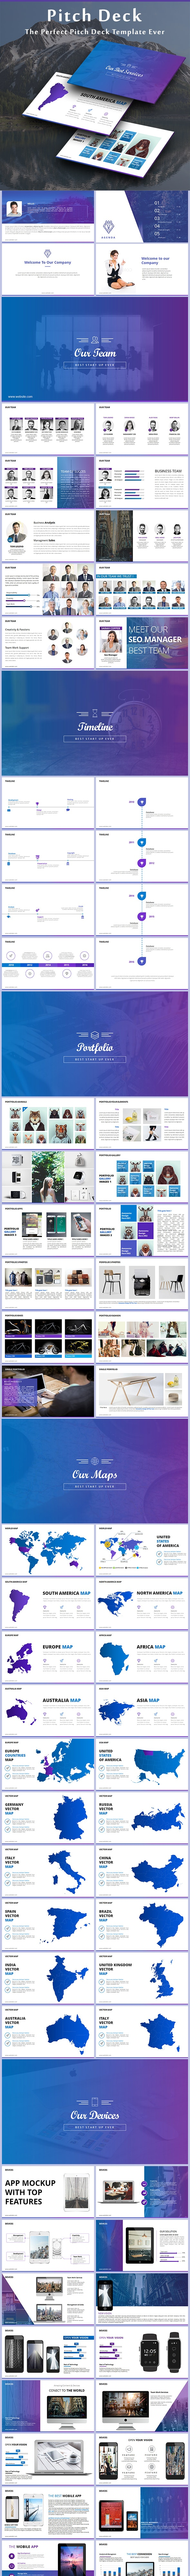 Pitch Deck - PowerPoint Templates Presentation Templates